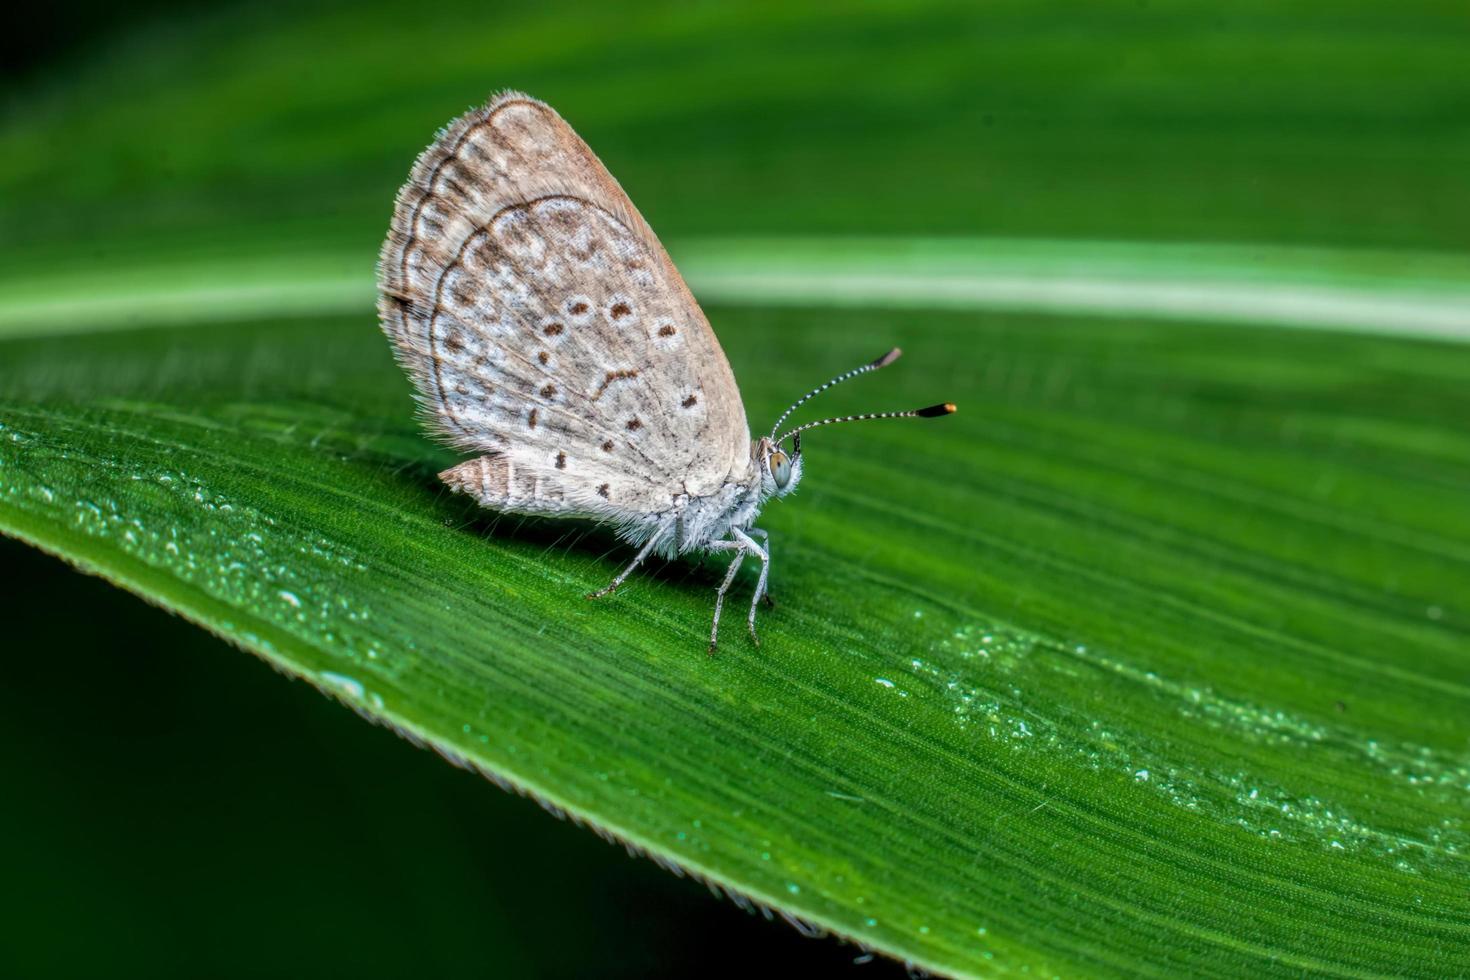 primer plano de mariposa sobre una ramita. foto